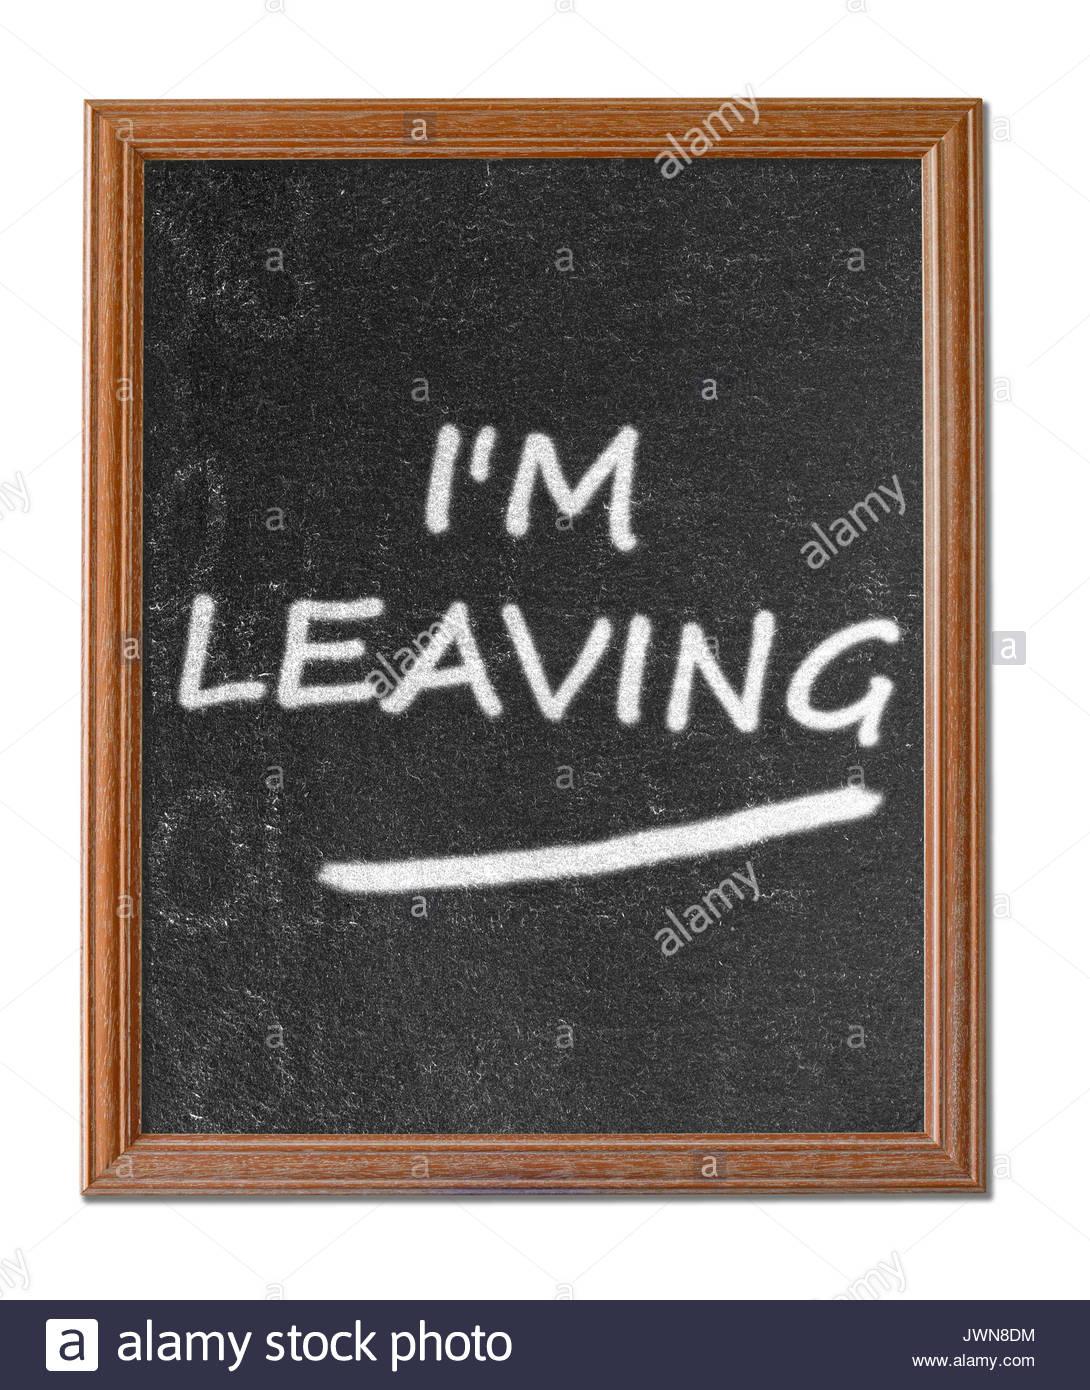 I'm leaving written on a blackboard, Blandford, Dorset, England - Stock Image